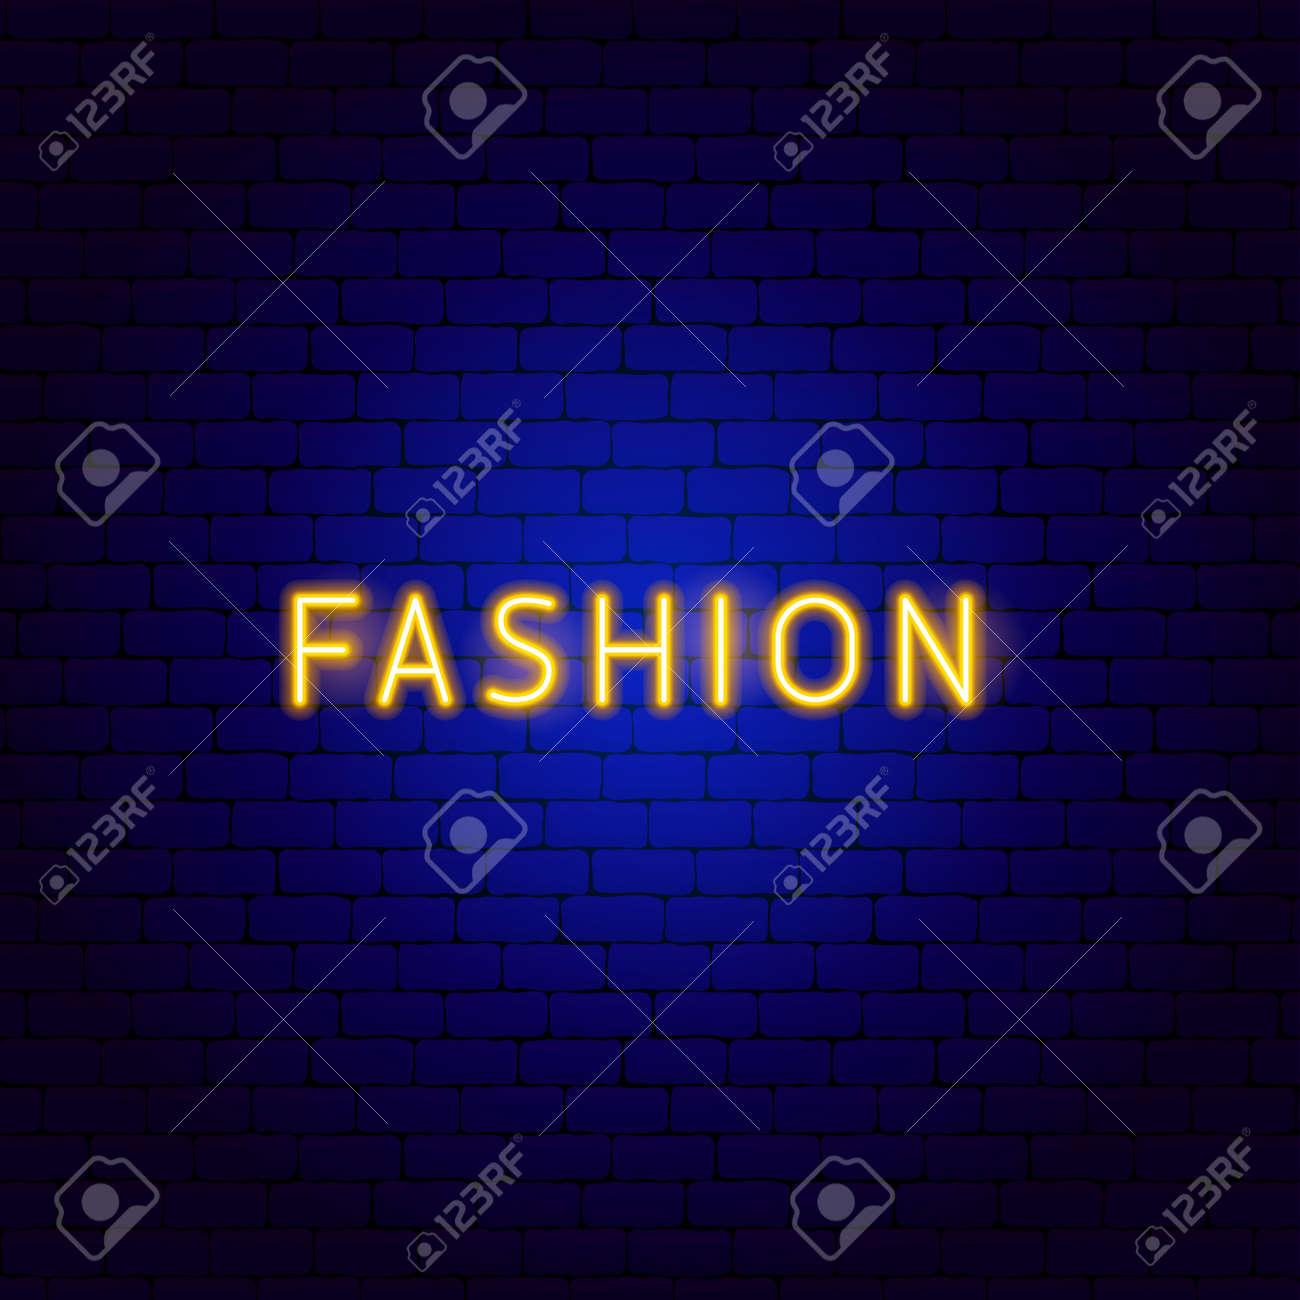 Fashion Neon Text - 168963331